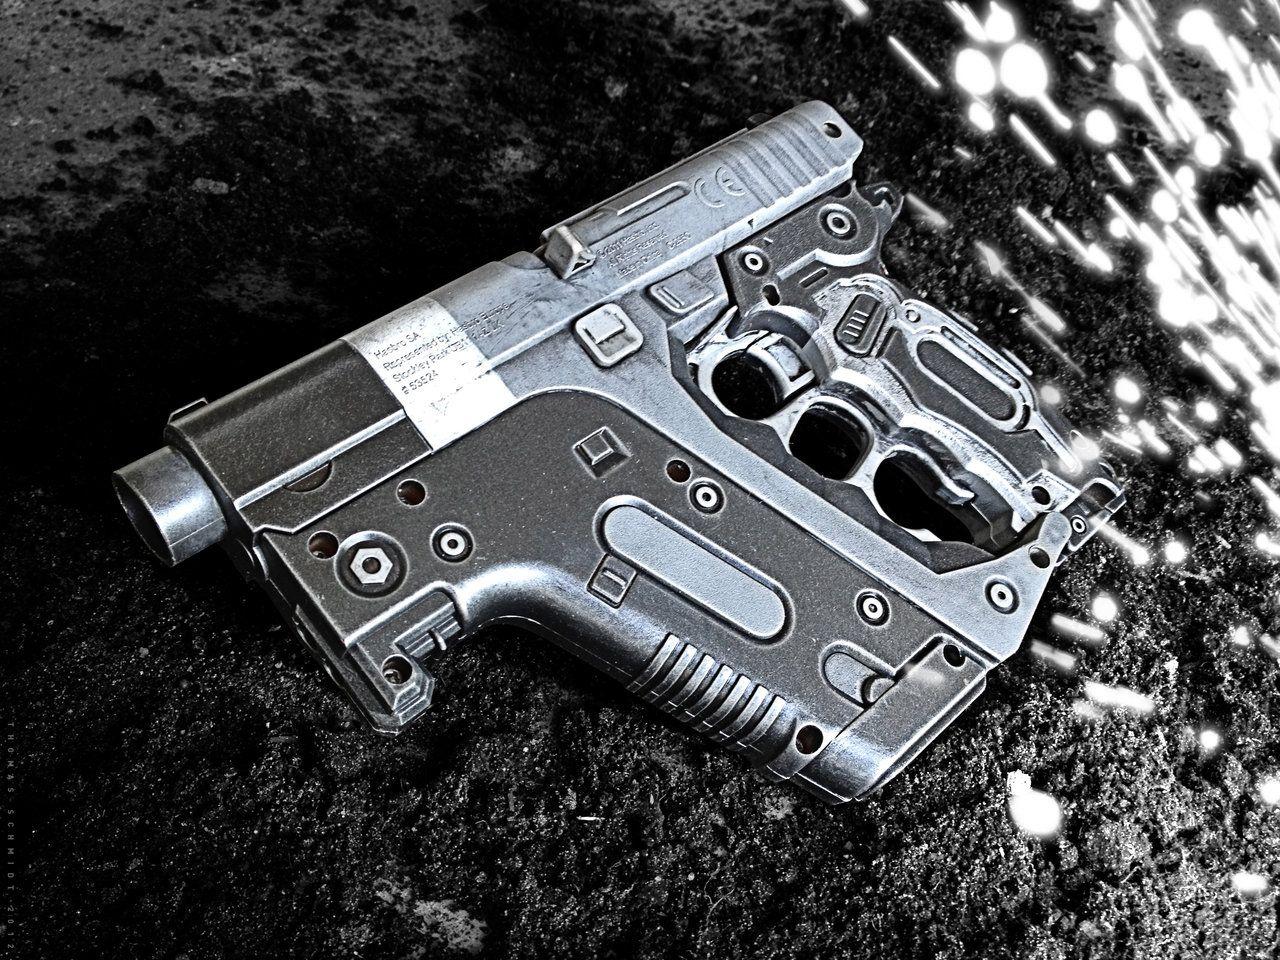 Оружие видео магнм фото 500-452